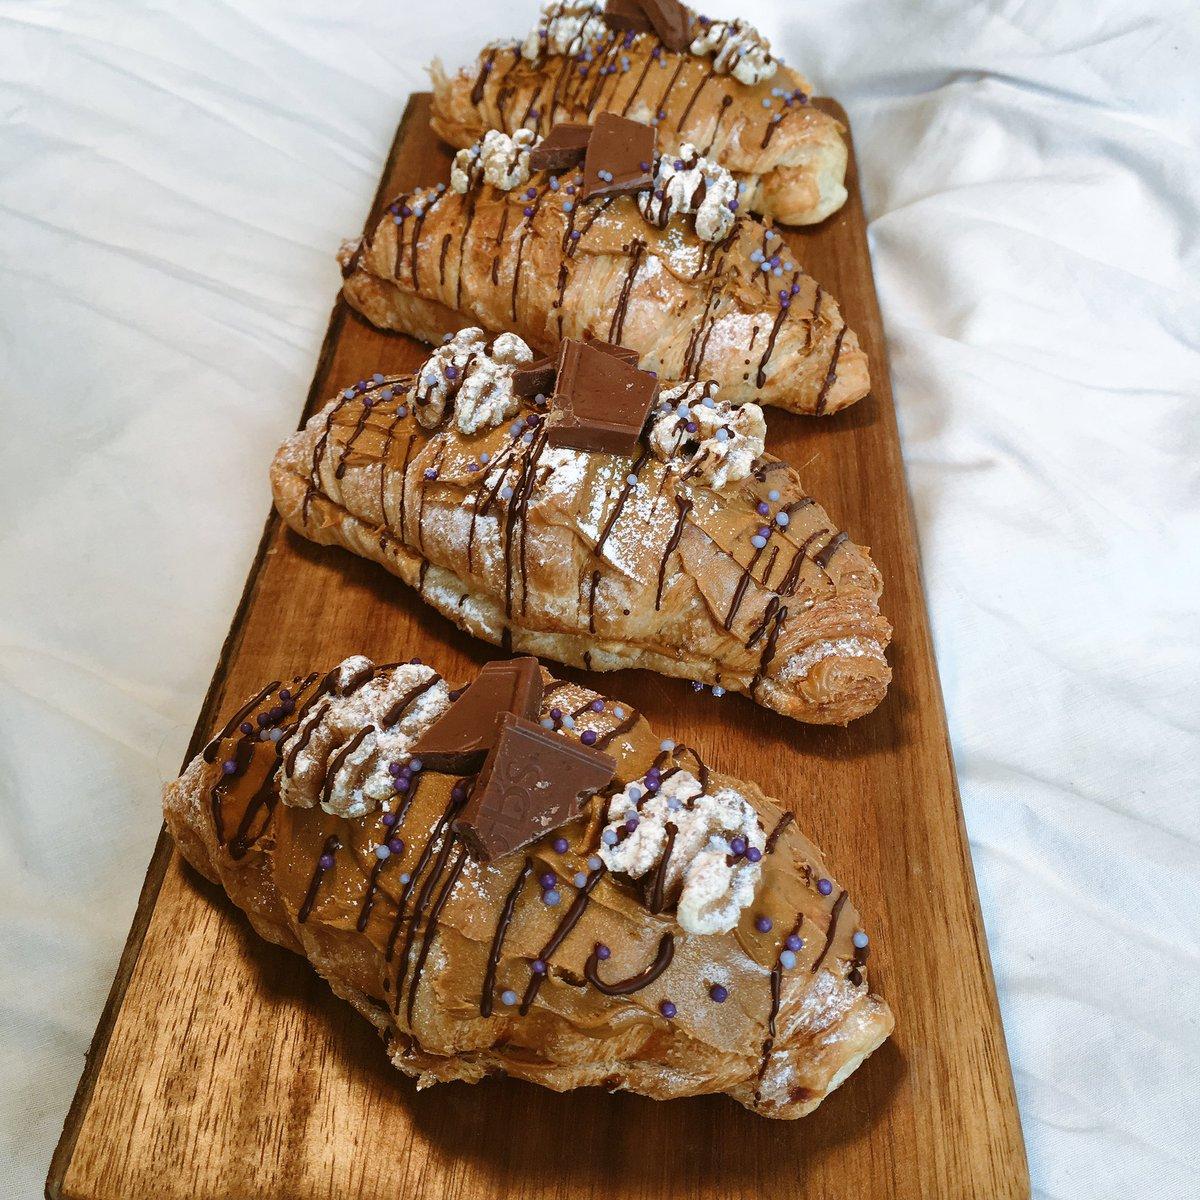 Salted Caramel, Chocolate & Walnut Croissants #SundayFunday https:...